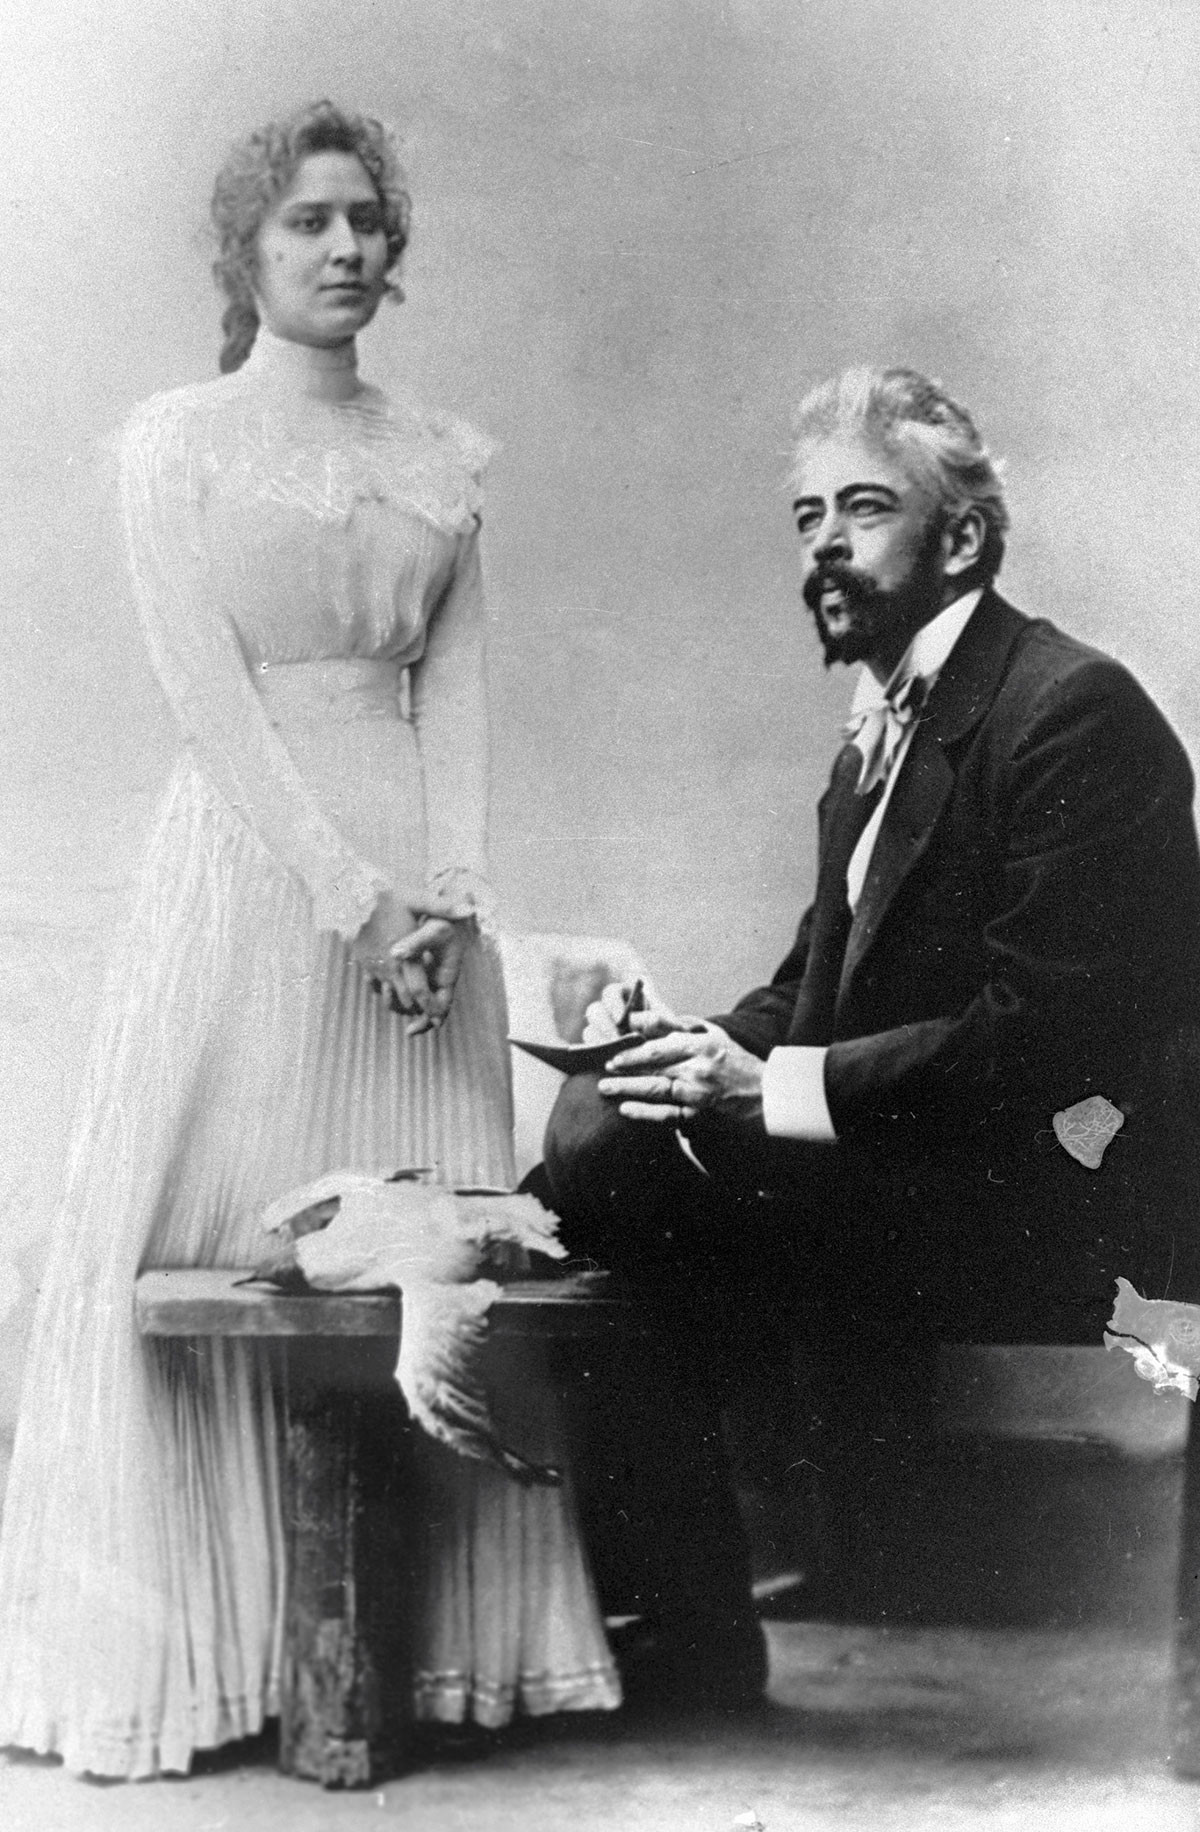 Maria Roksanova as Nina and Konstantin Stanislavsky as Trigorin in 'The Seagull'.